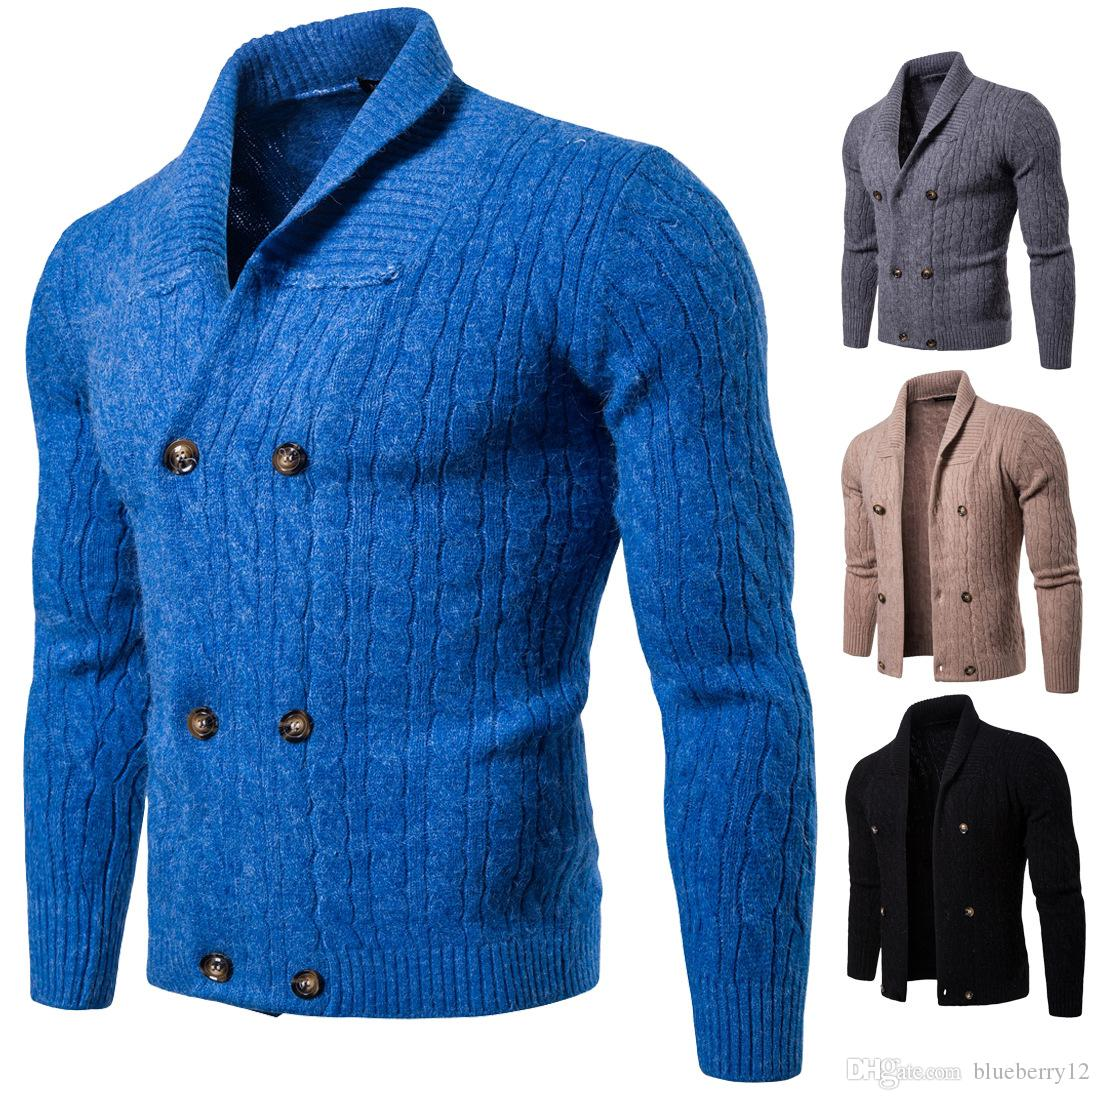 18 FW Mens Knitted Coats Moda solapa cuello suéteres de doble botonadura Slim Fit Warm Chaquetas de tejer